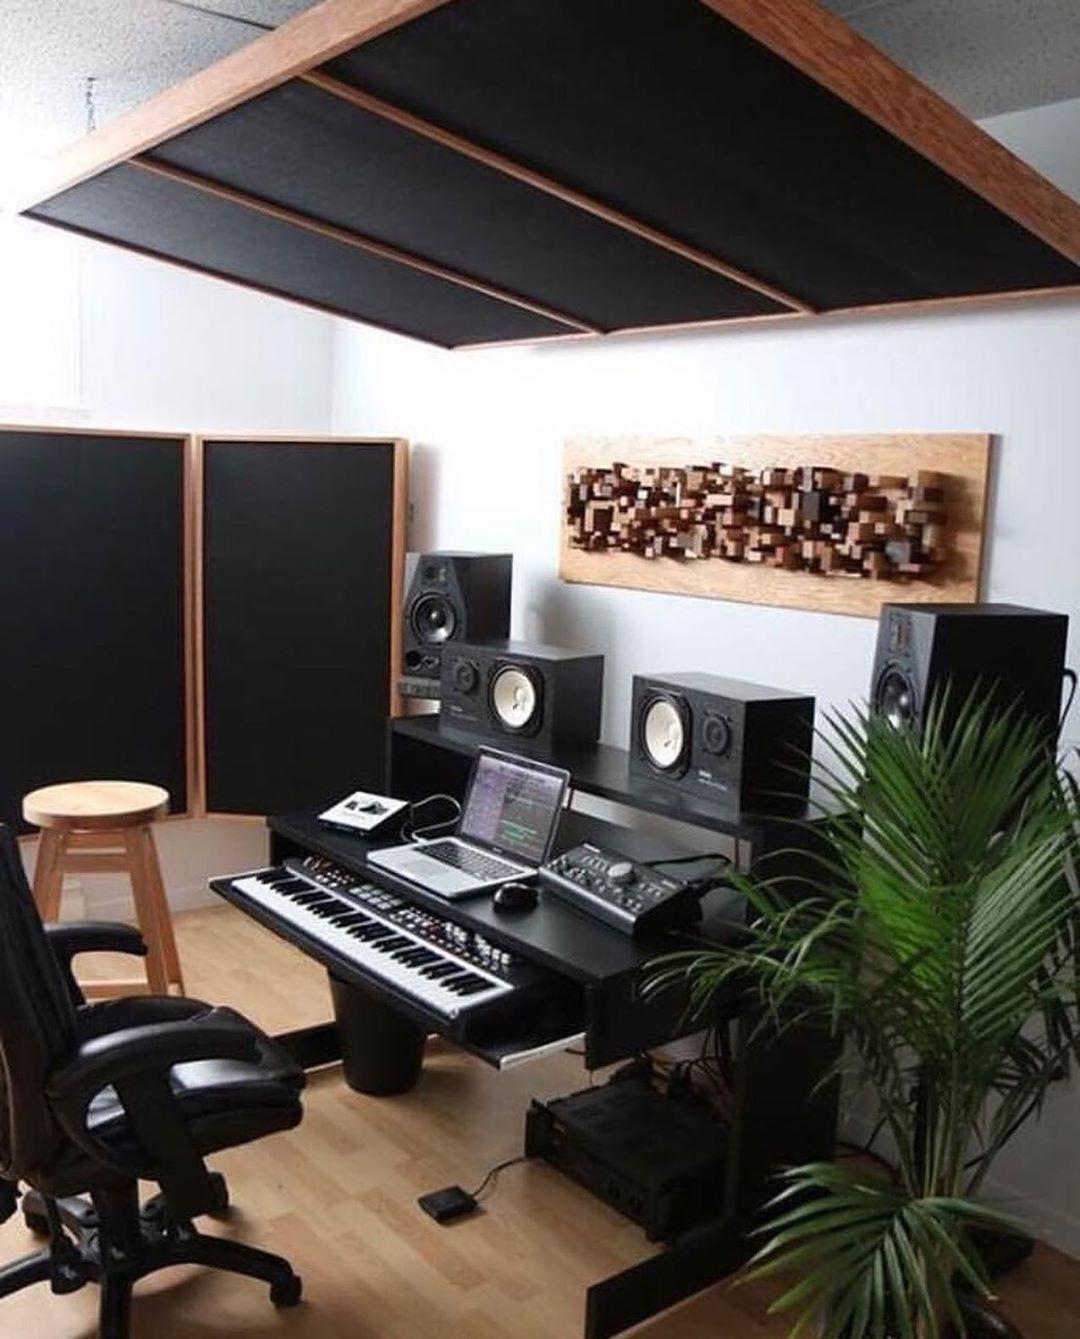 Beats Maker Studio Enregistrement Instrumental Rap Musique 2019 Studio Interior Home Studio Music Home Studio Setup